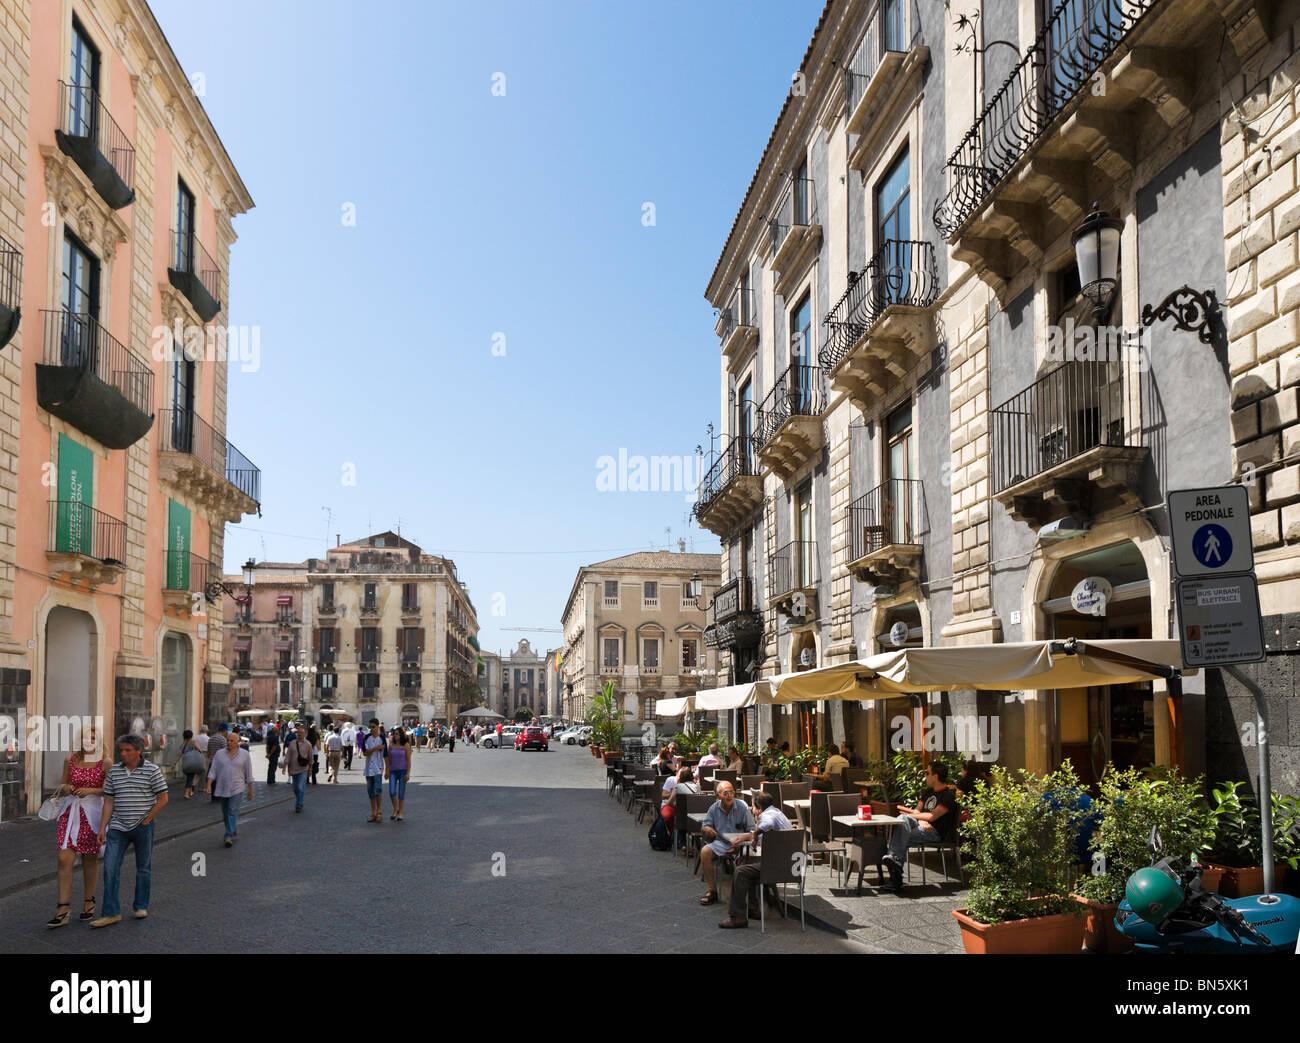 Straßencafé im Zentrum Stadt, Catania, South East Coast, Sizilien, Italien Stockbild